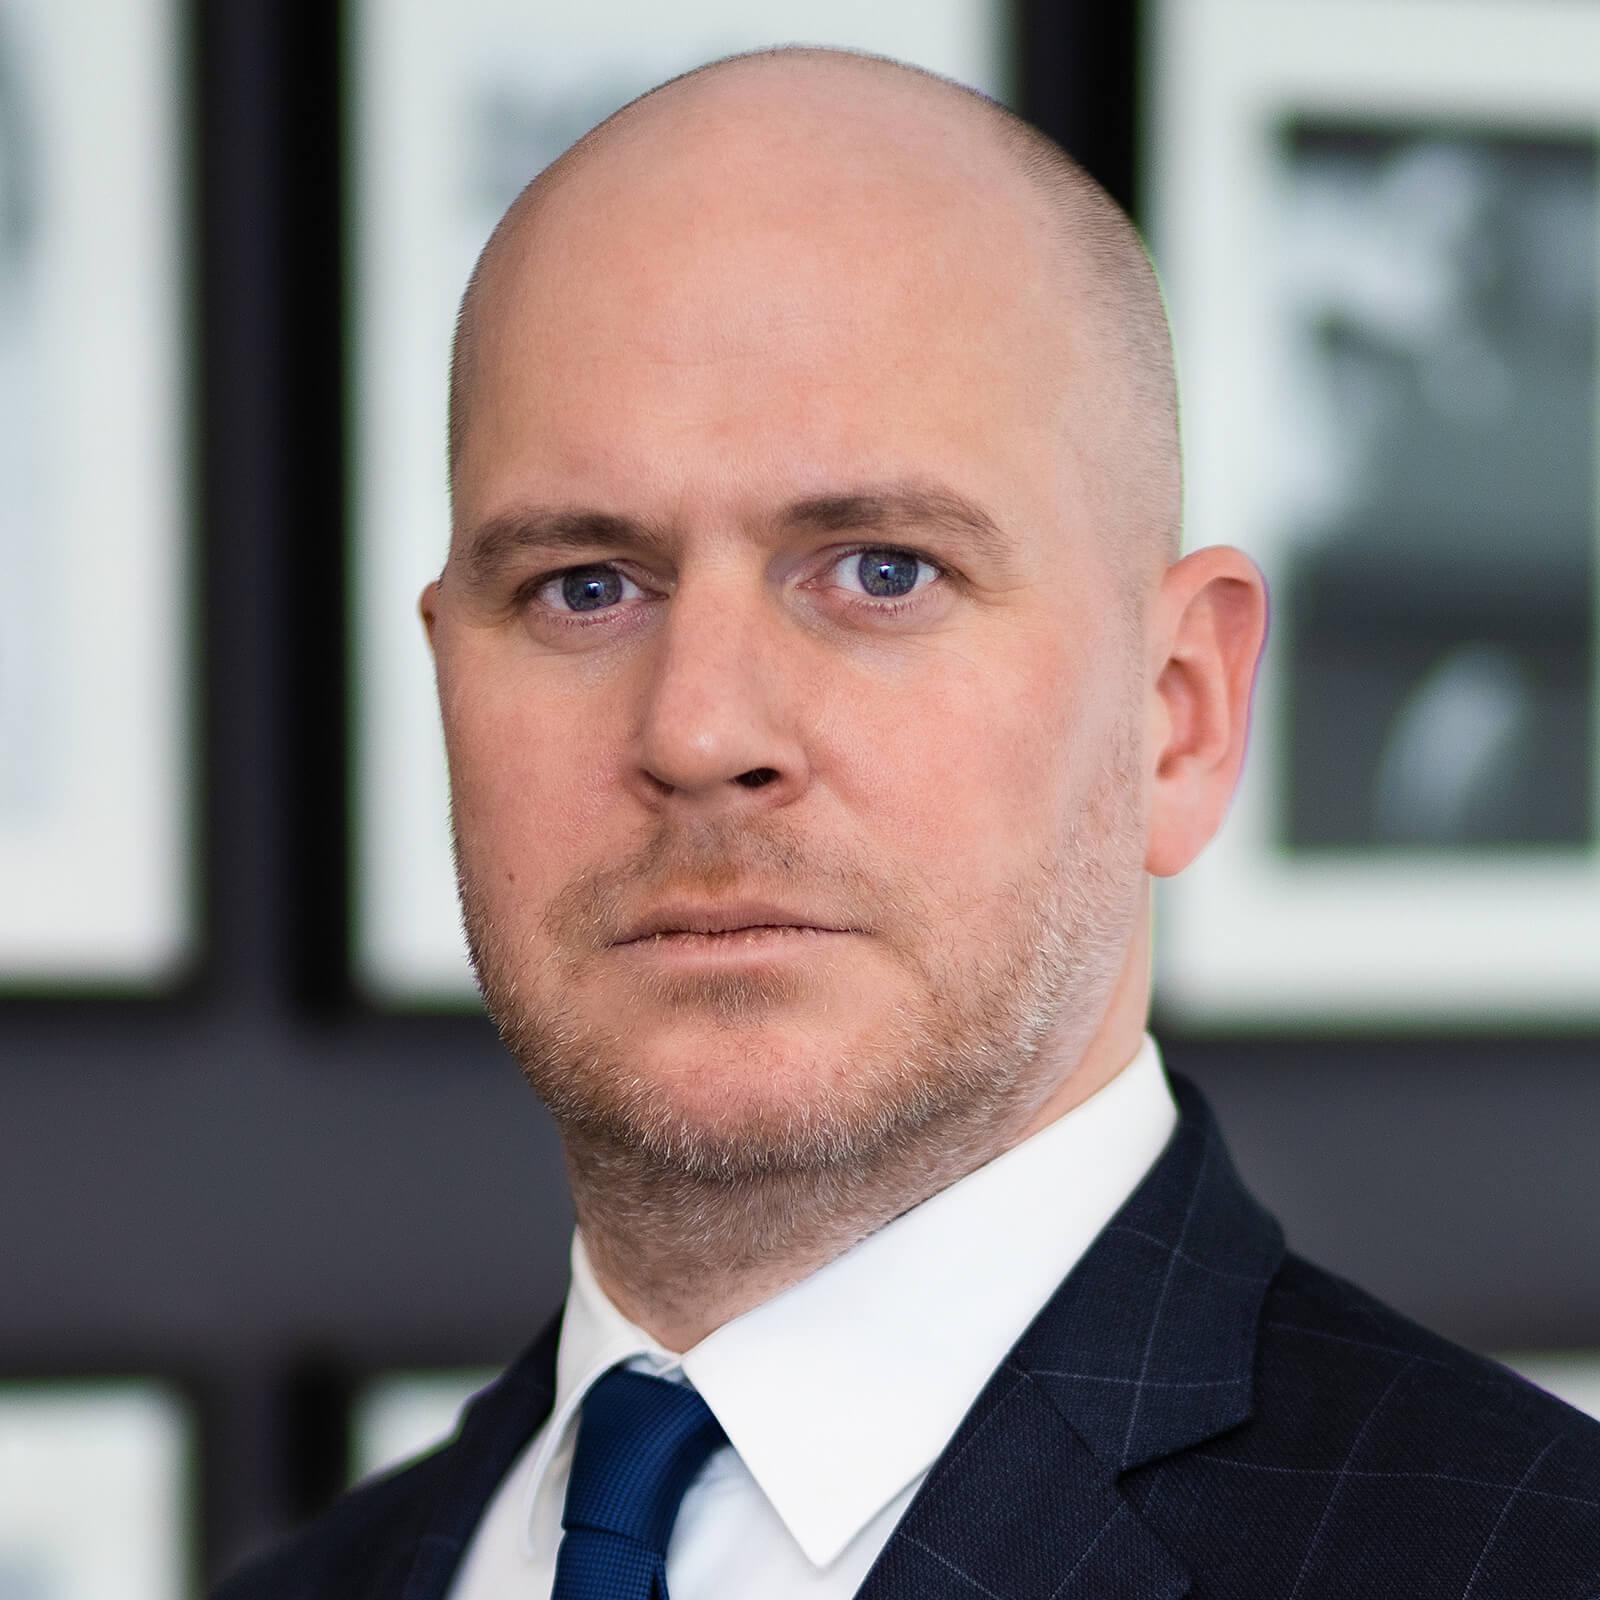 Portrait - Rechtsanwalt Martin Bücher - Birkenstock Rechtsanwälte